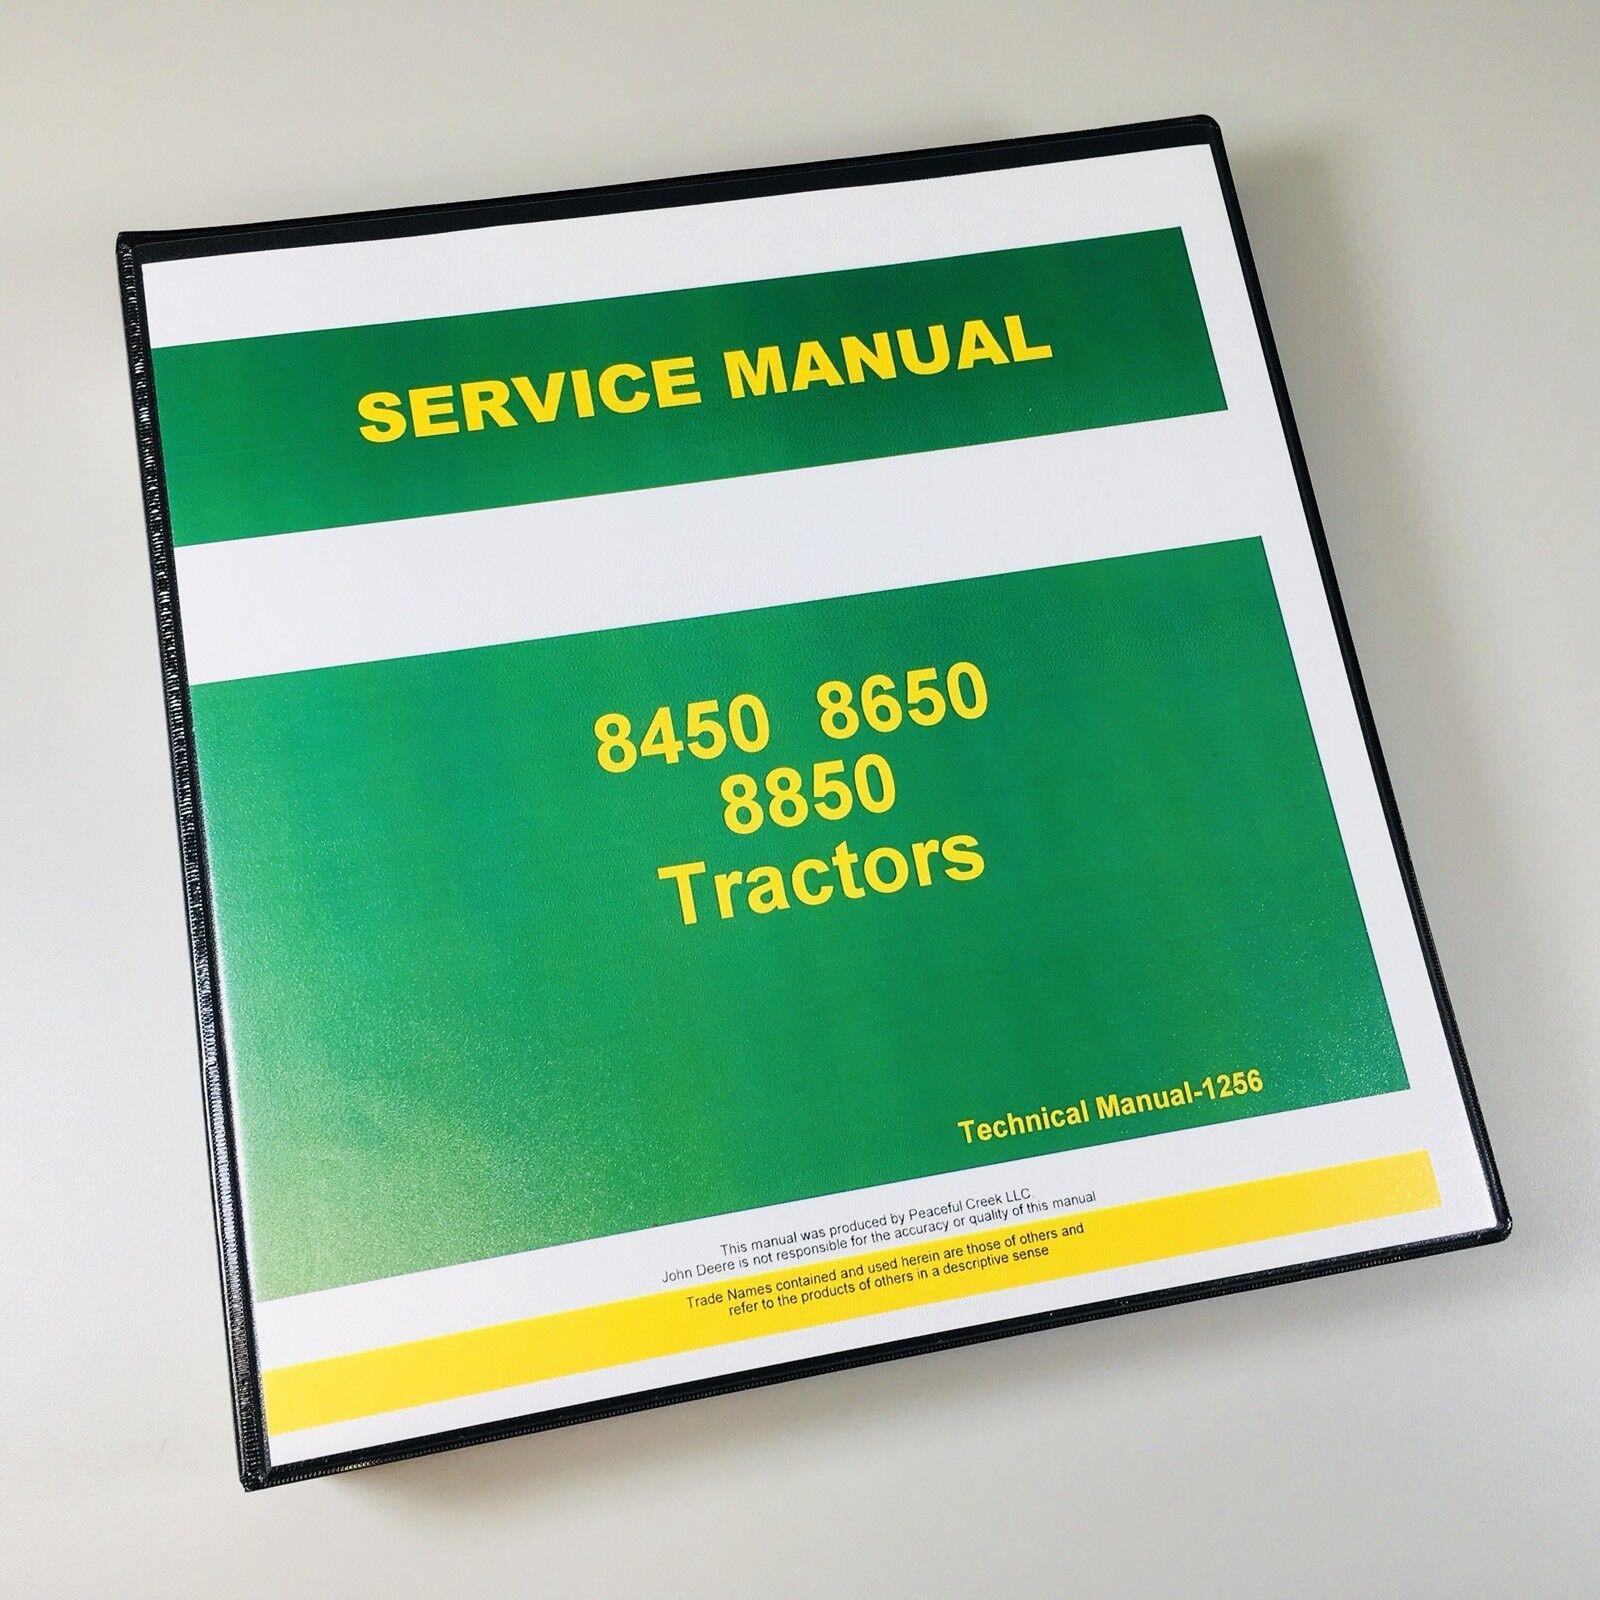 service testing manual for john deere 8450 8650 8850 tractor repair rh ebay com John Deere 1070 john deere 850 manual free download